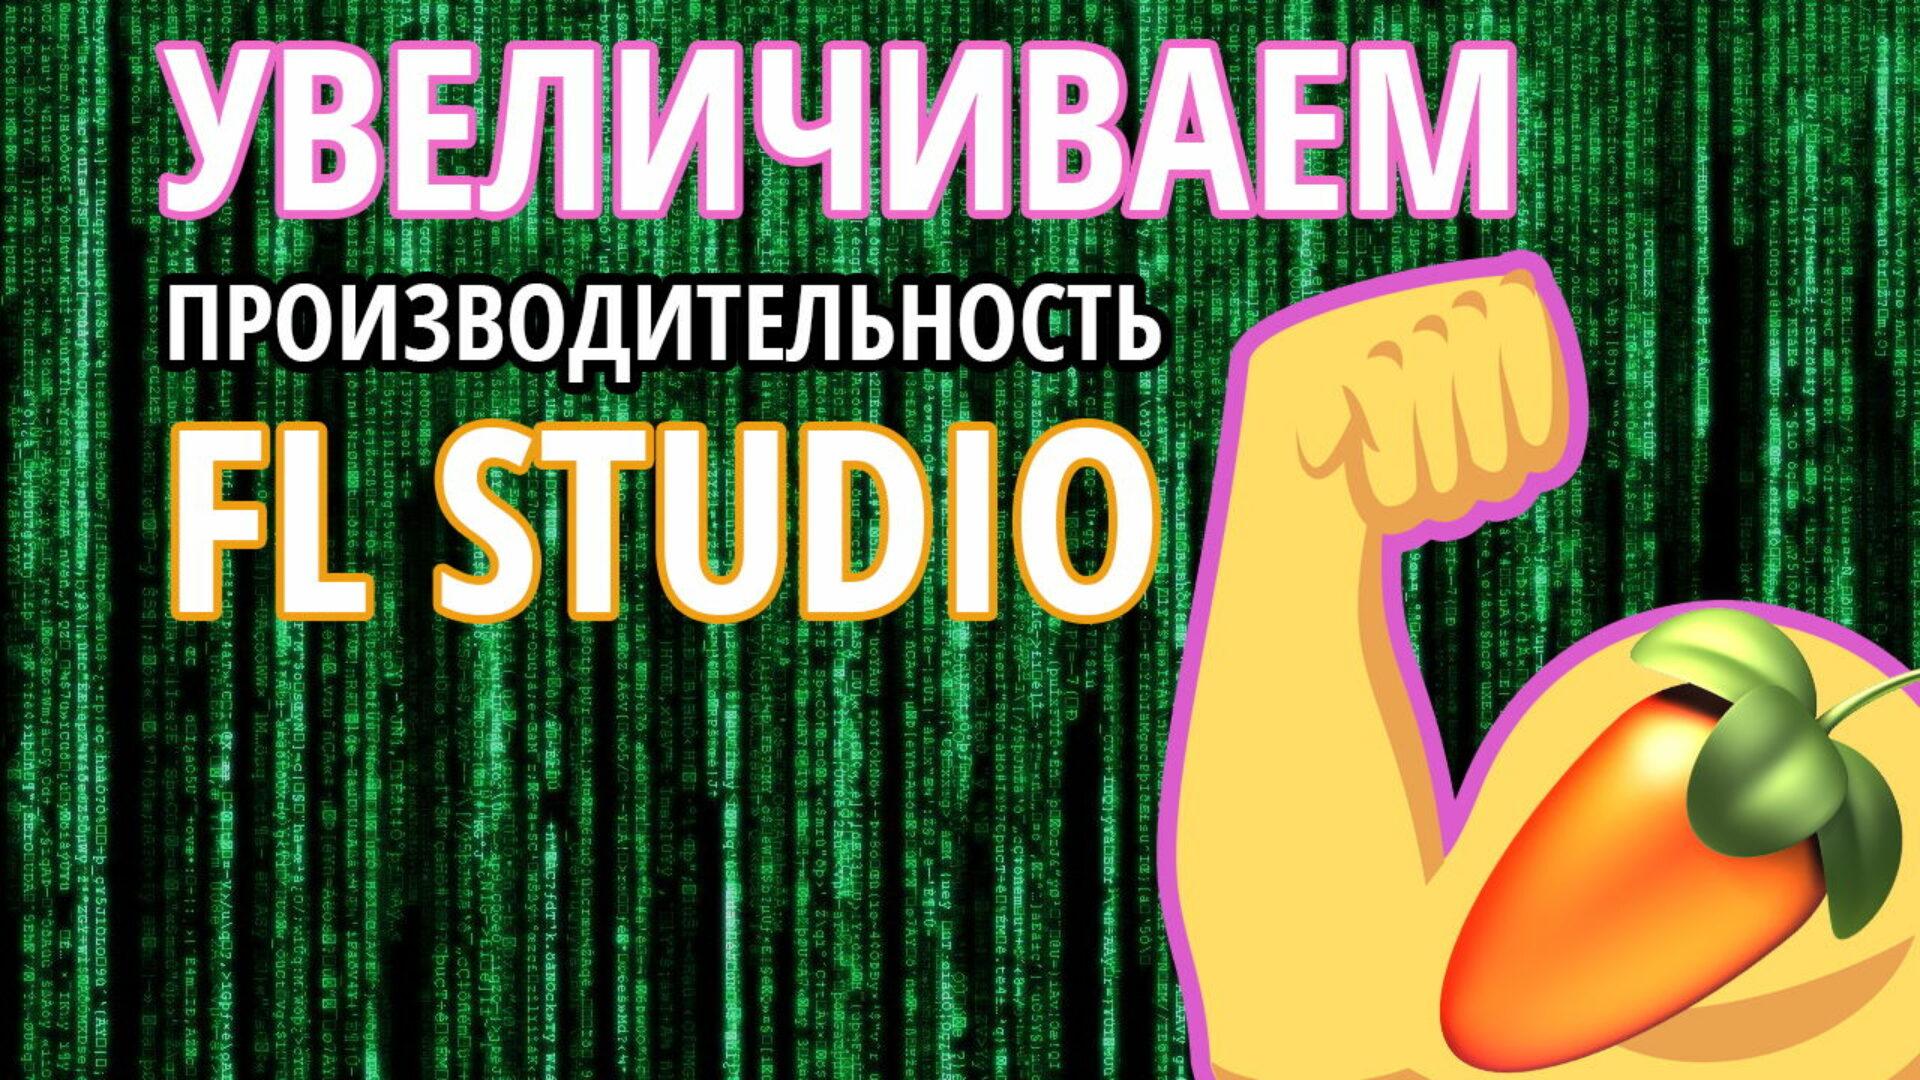 Оптимизация FL Studio. 8 секретов.